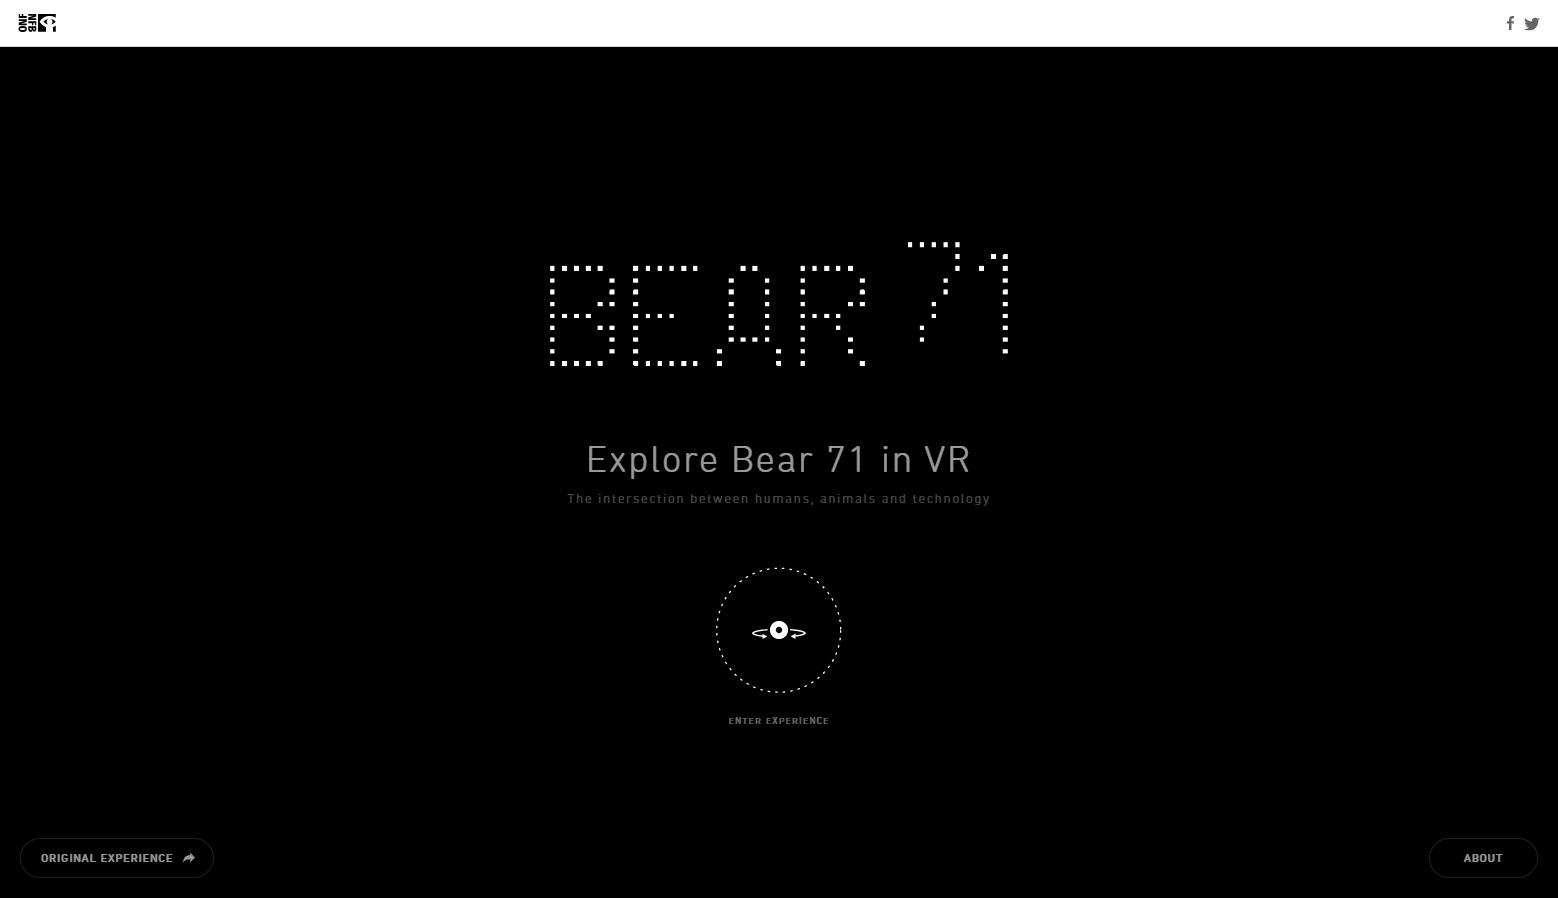 Bear 71 VR